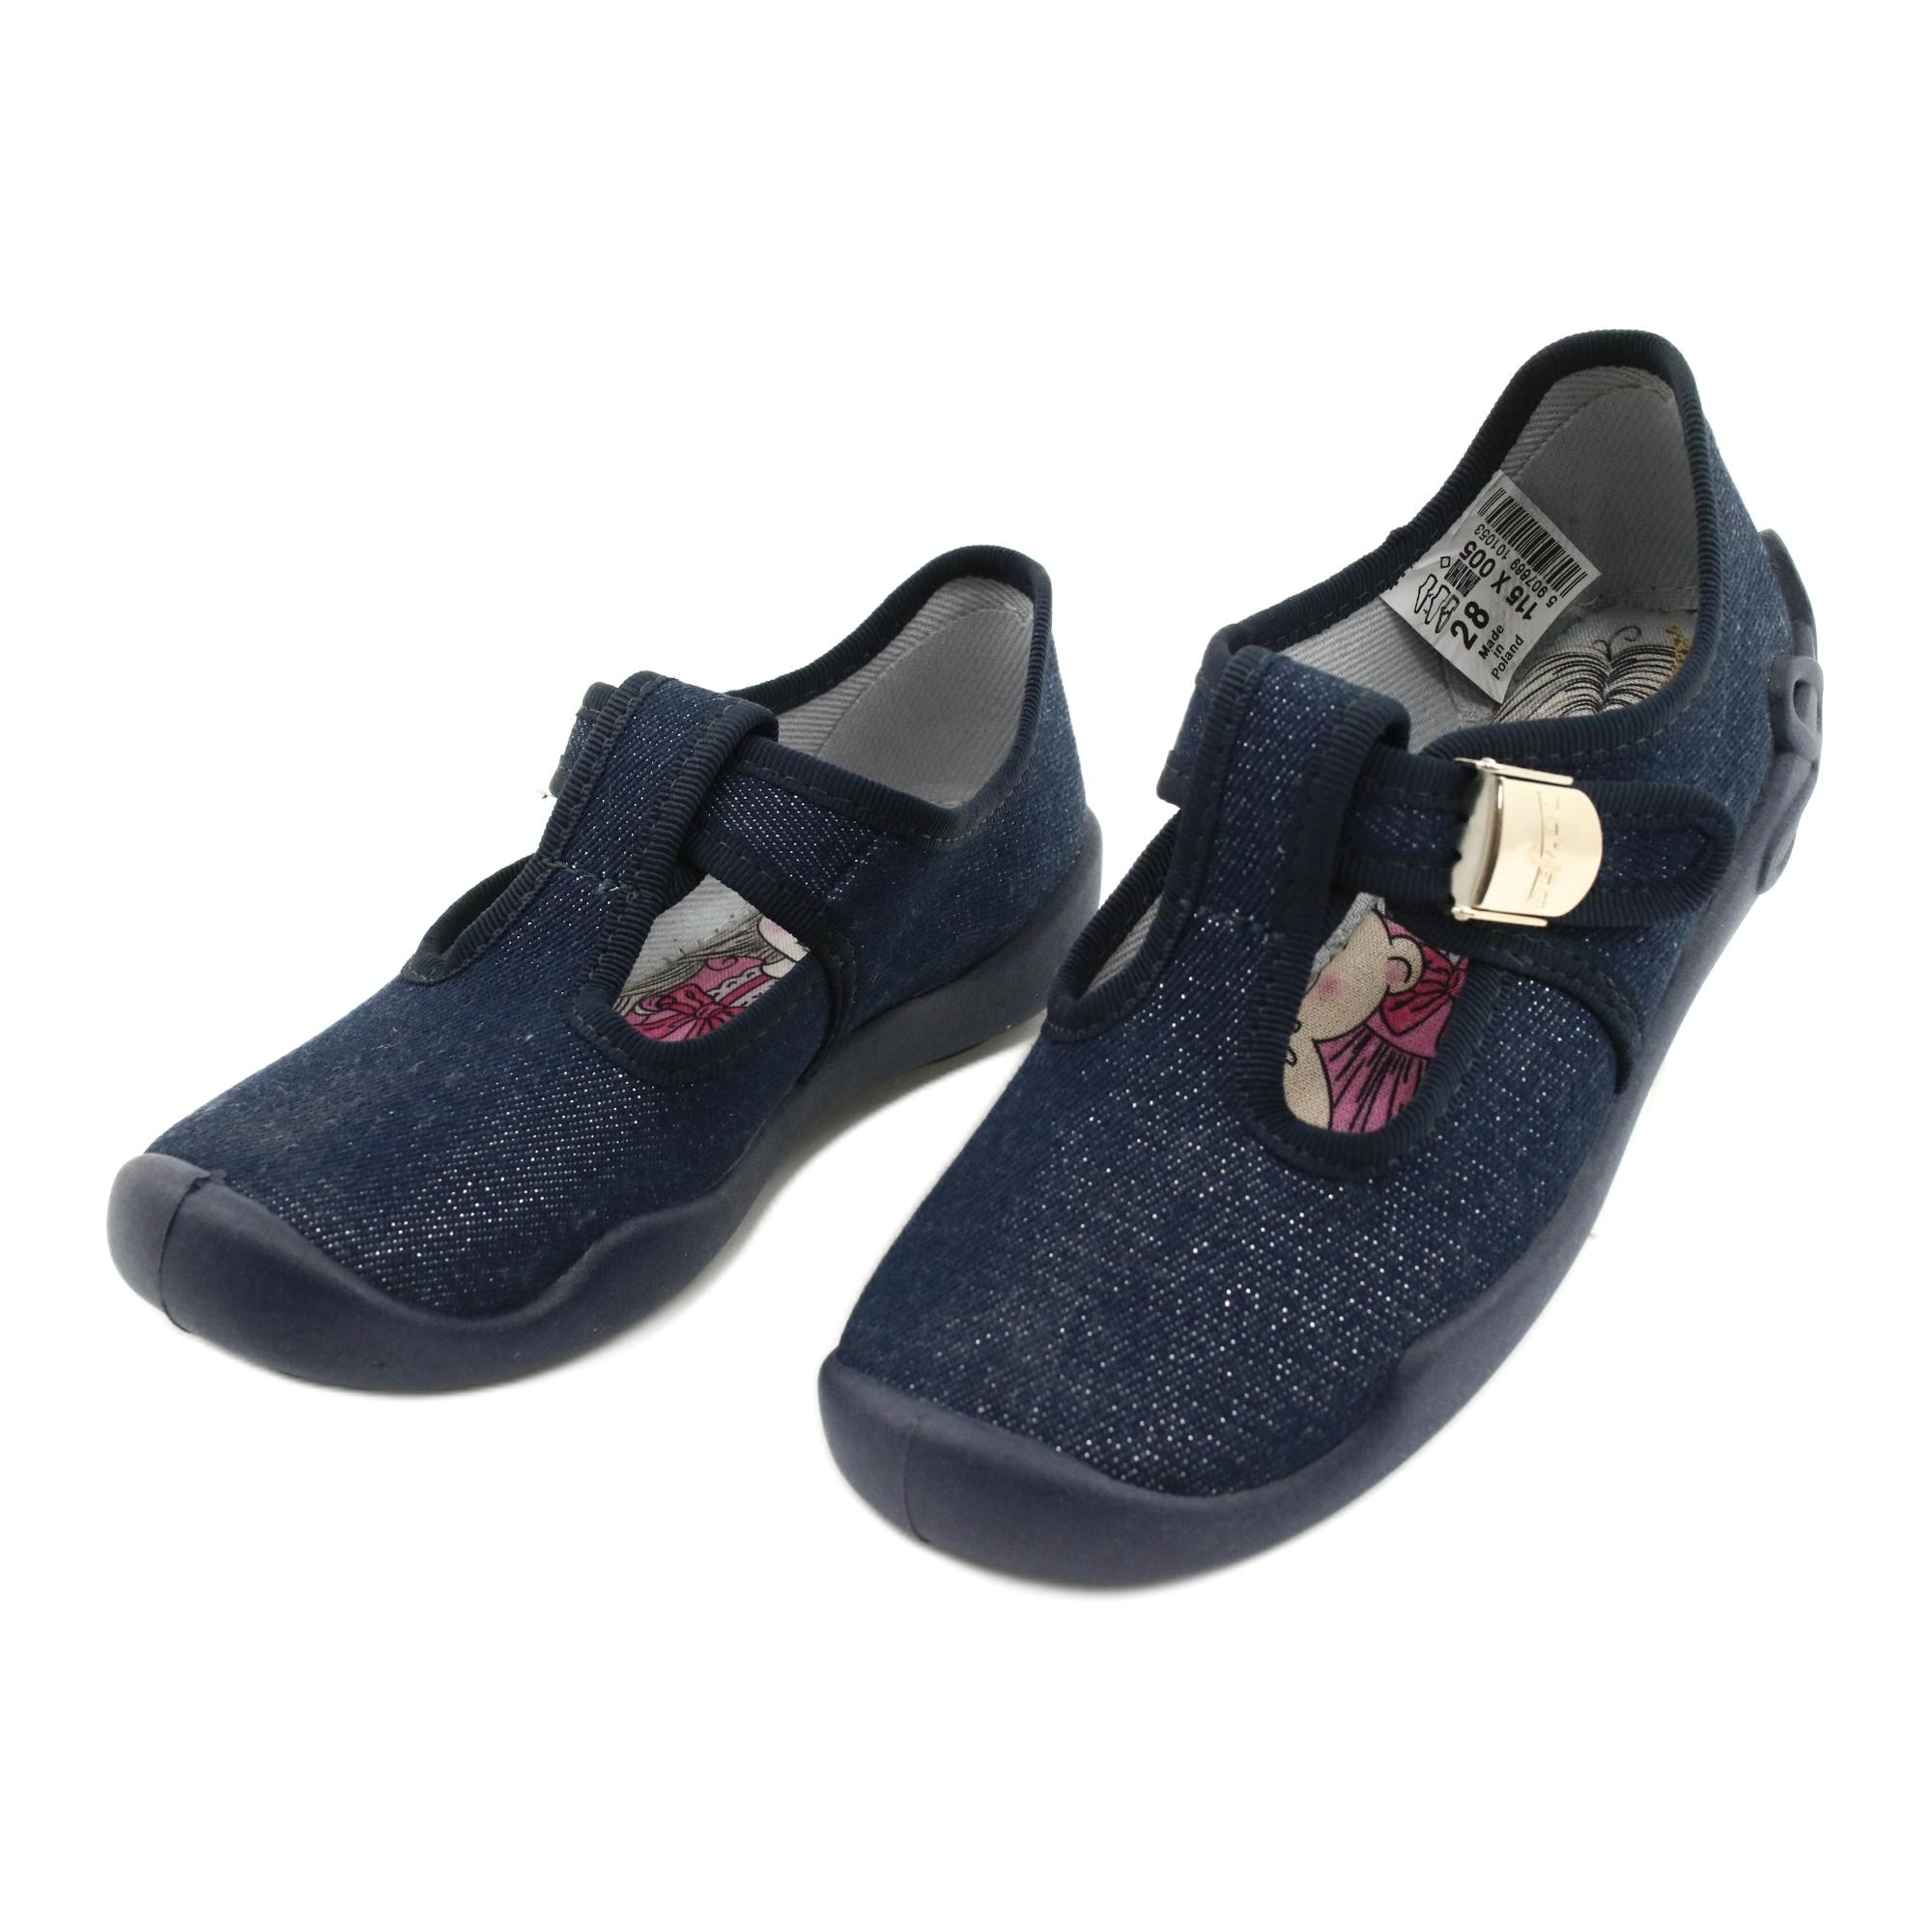 miniatura 5 - Scarpe per bambini Befado in bianco blu navy